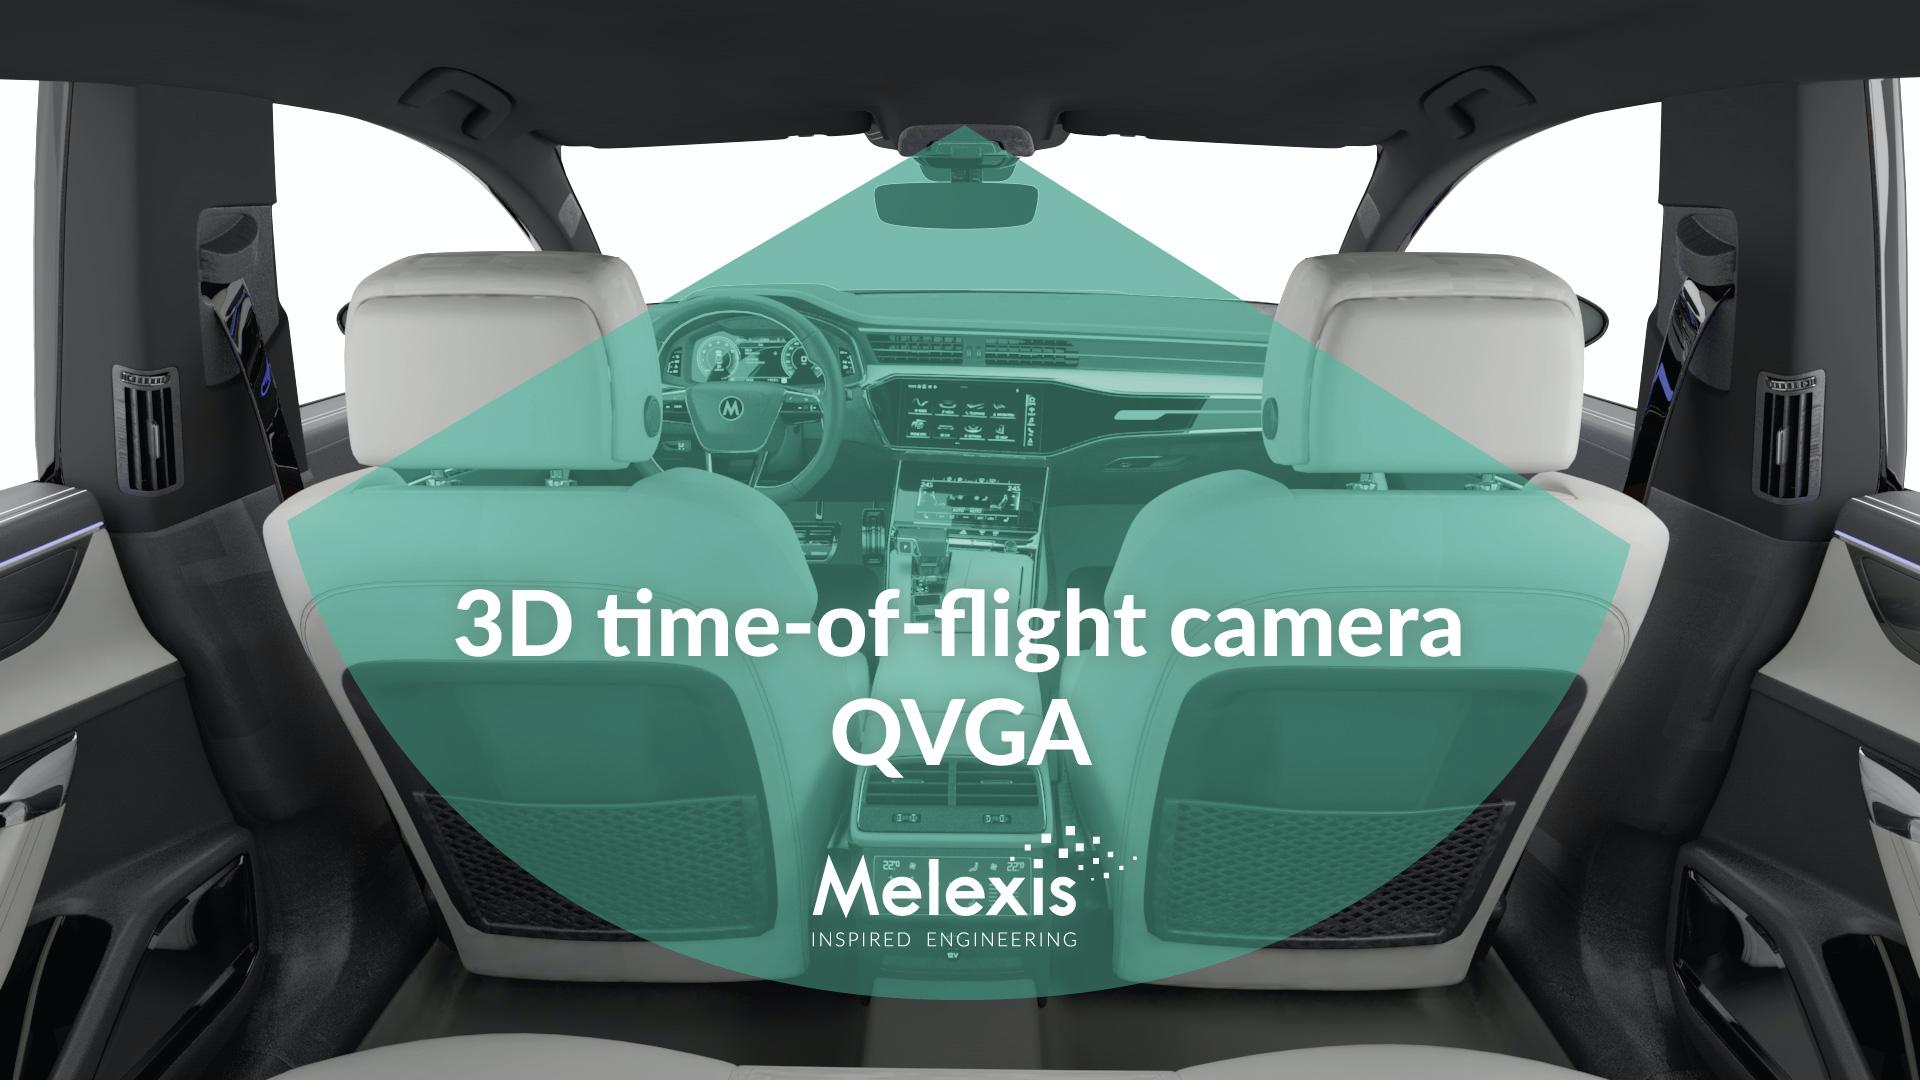 Melexis 推出全新 QVGA 分辨率飞行时间传感器 IC,进一步完善第三代产品组合